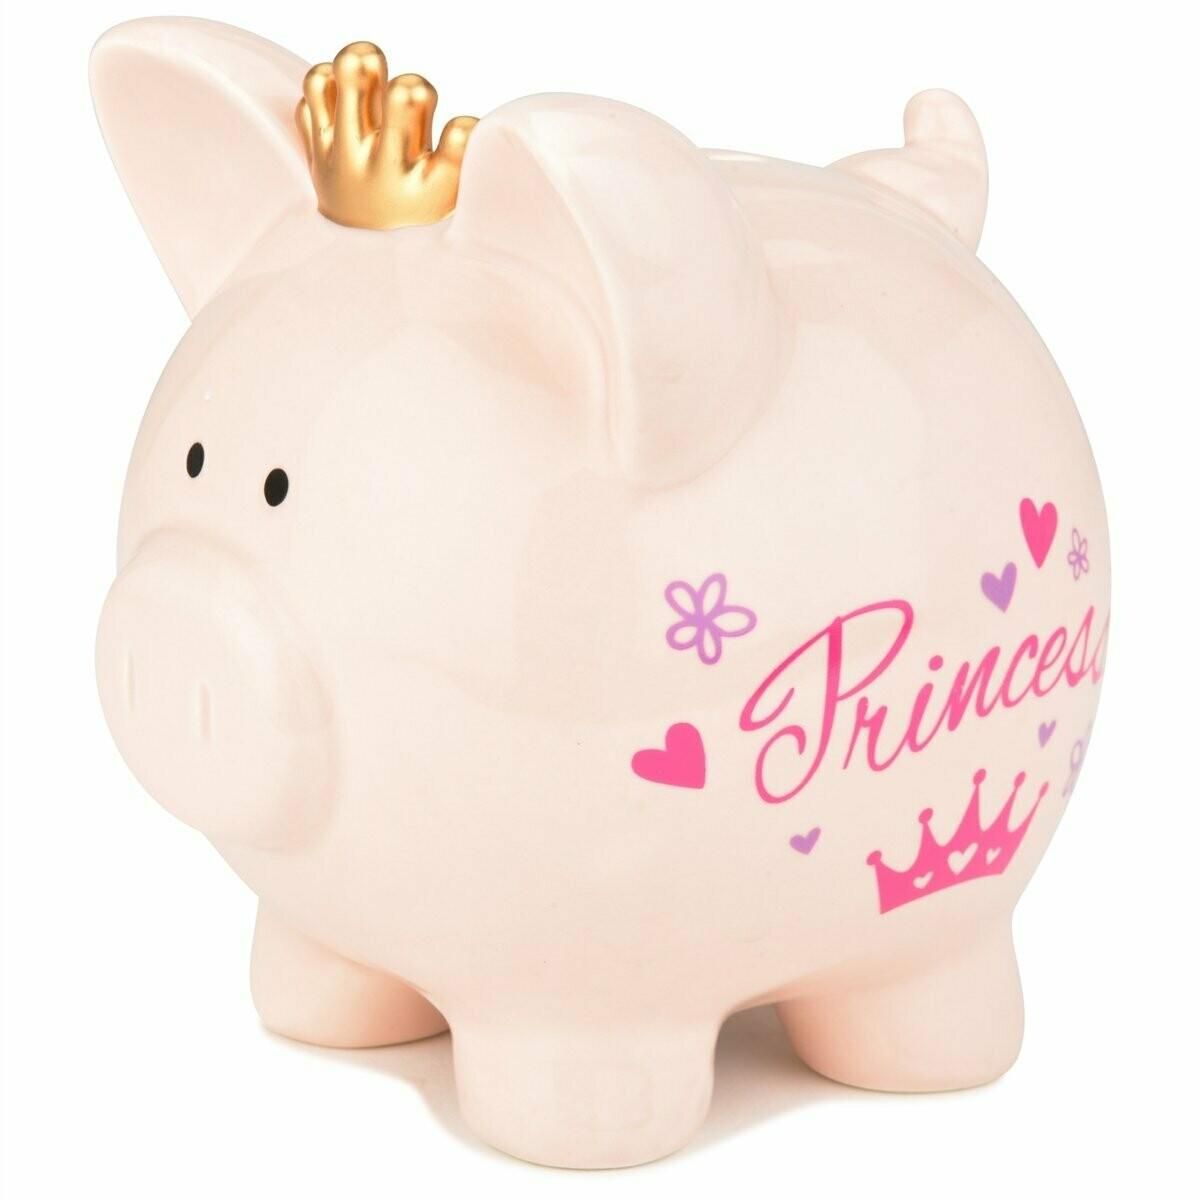 PIG SHAPE BANK PRINCESS PIG